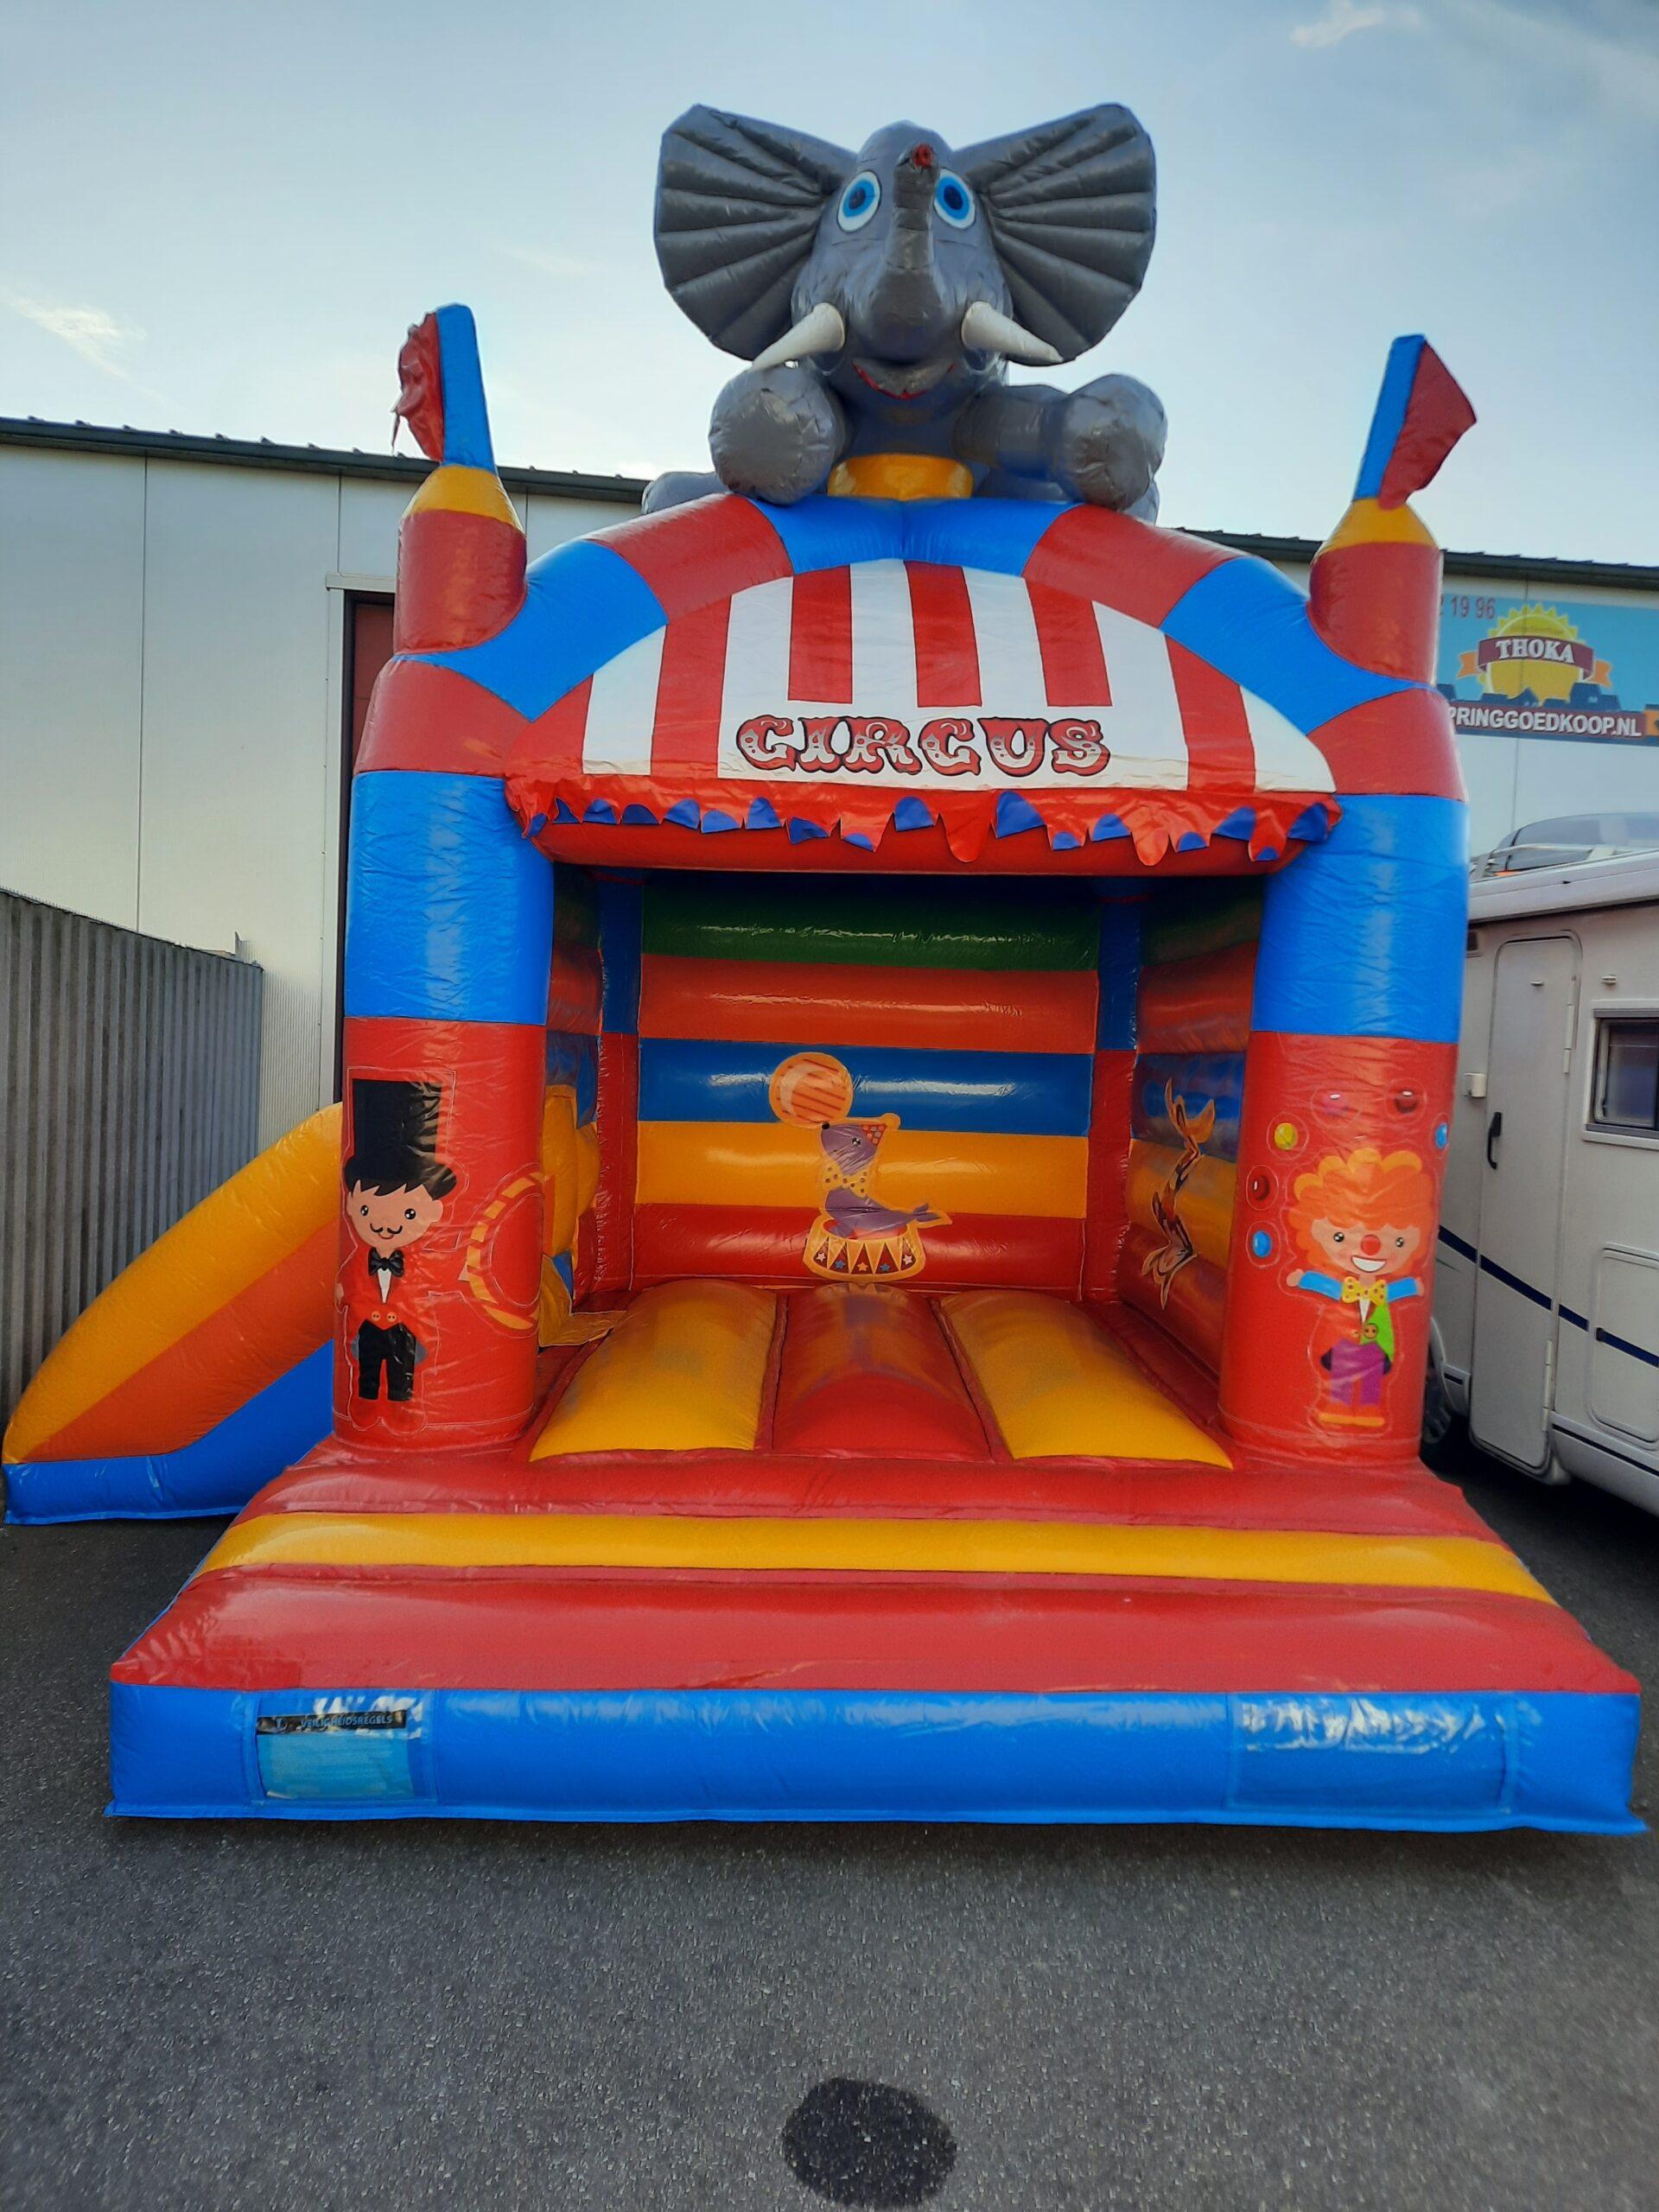 springkussen-circus